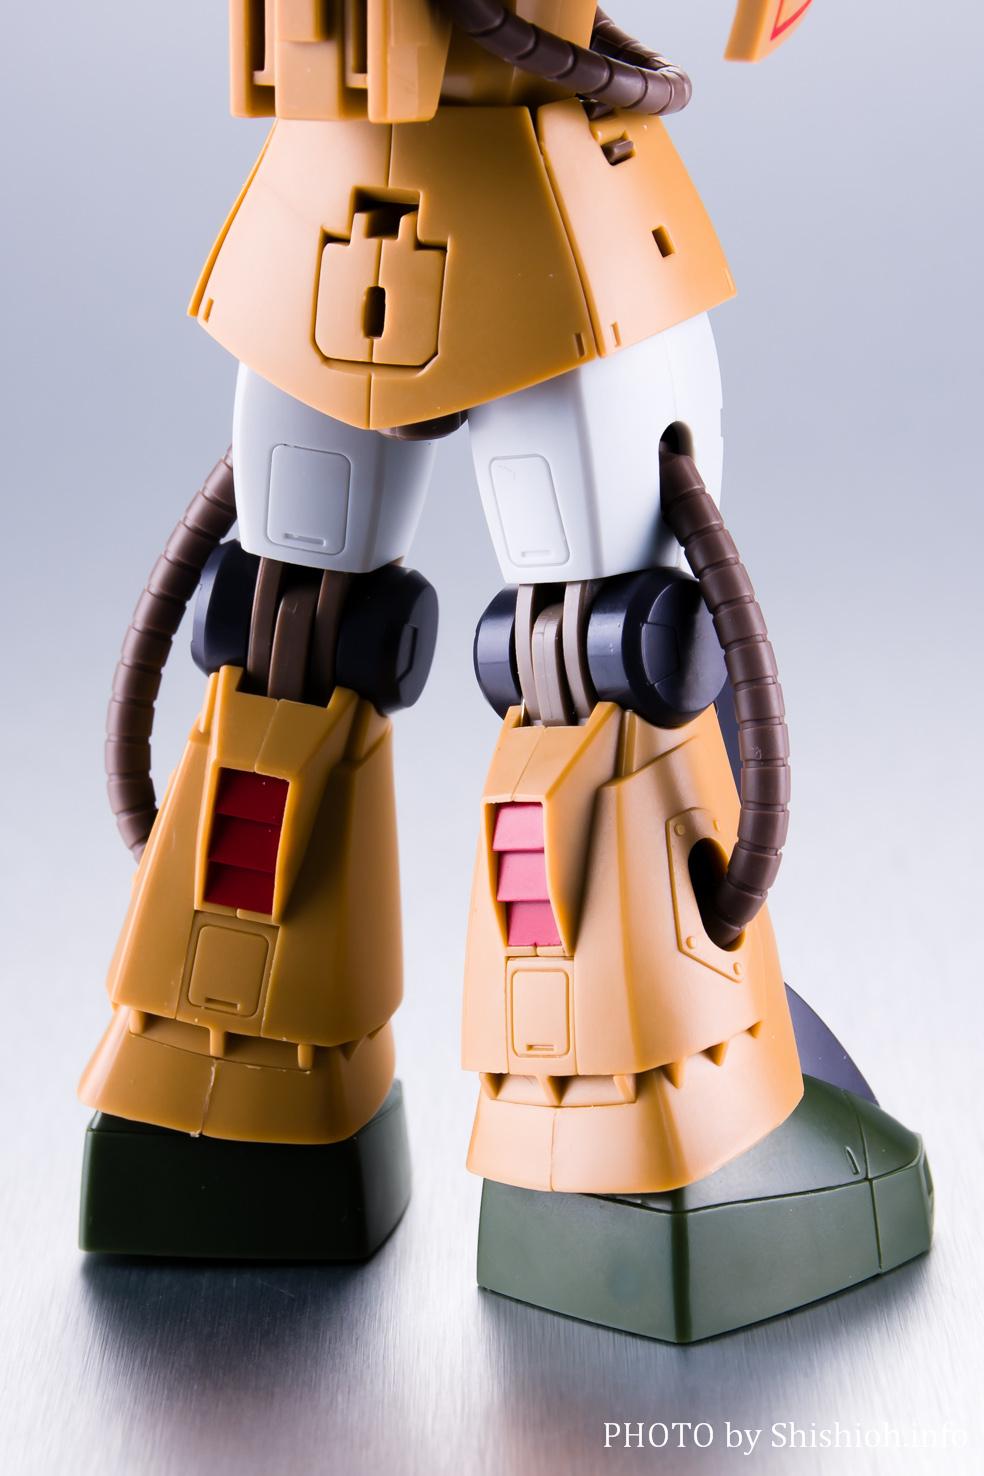 ROBOT魂 〈SIDE MS〉 MS-06K ザク・キャノン ver. A.N.I.M.E.